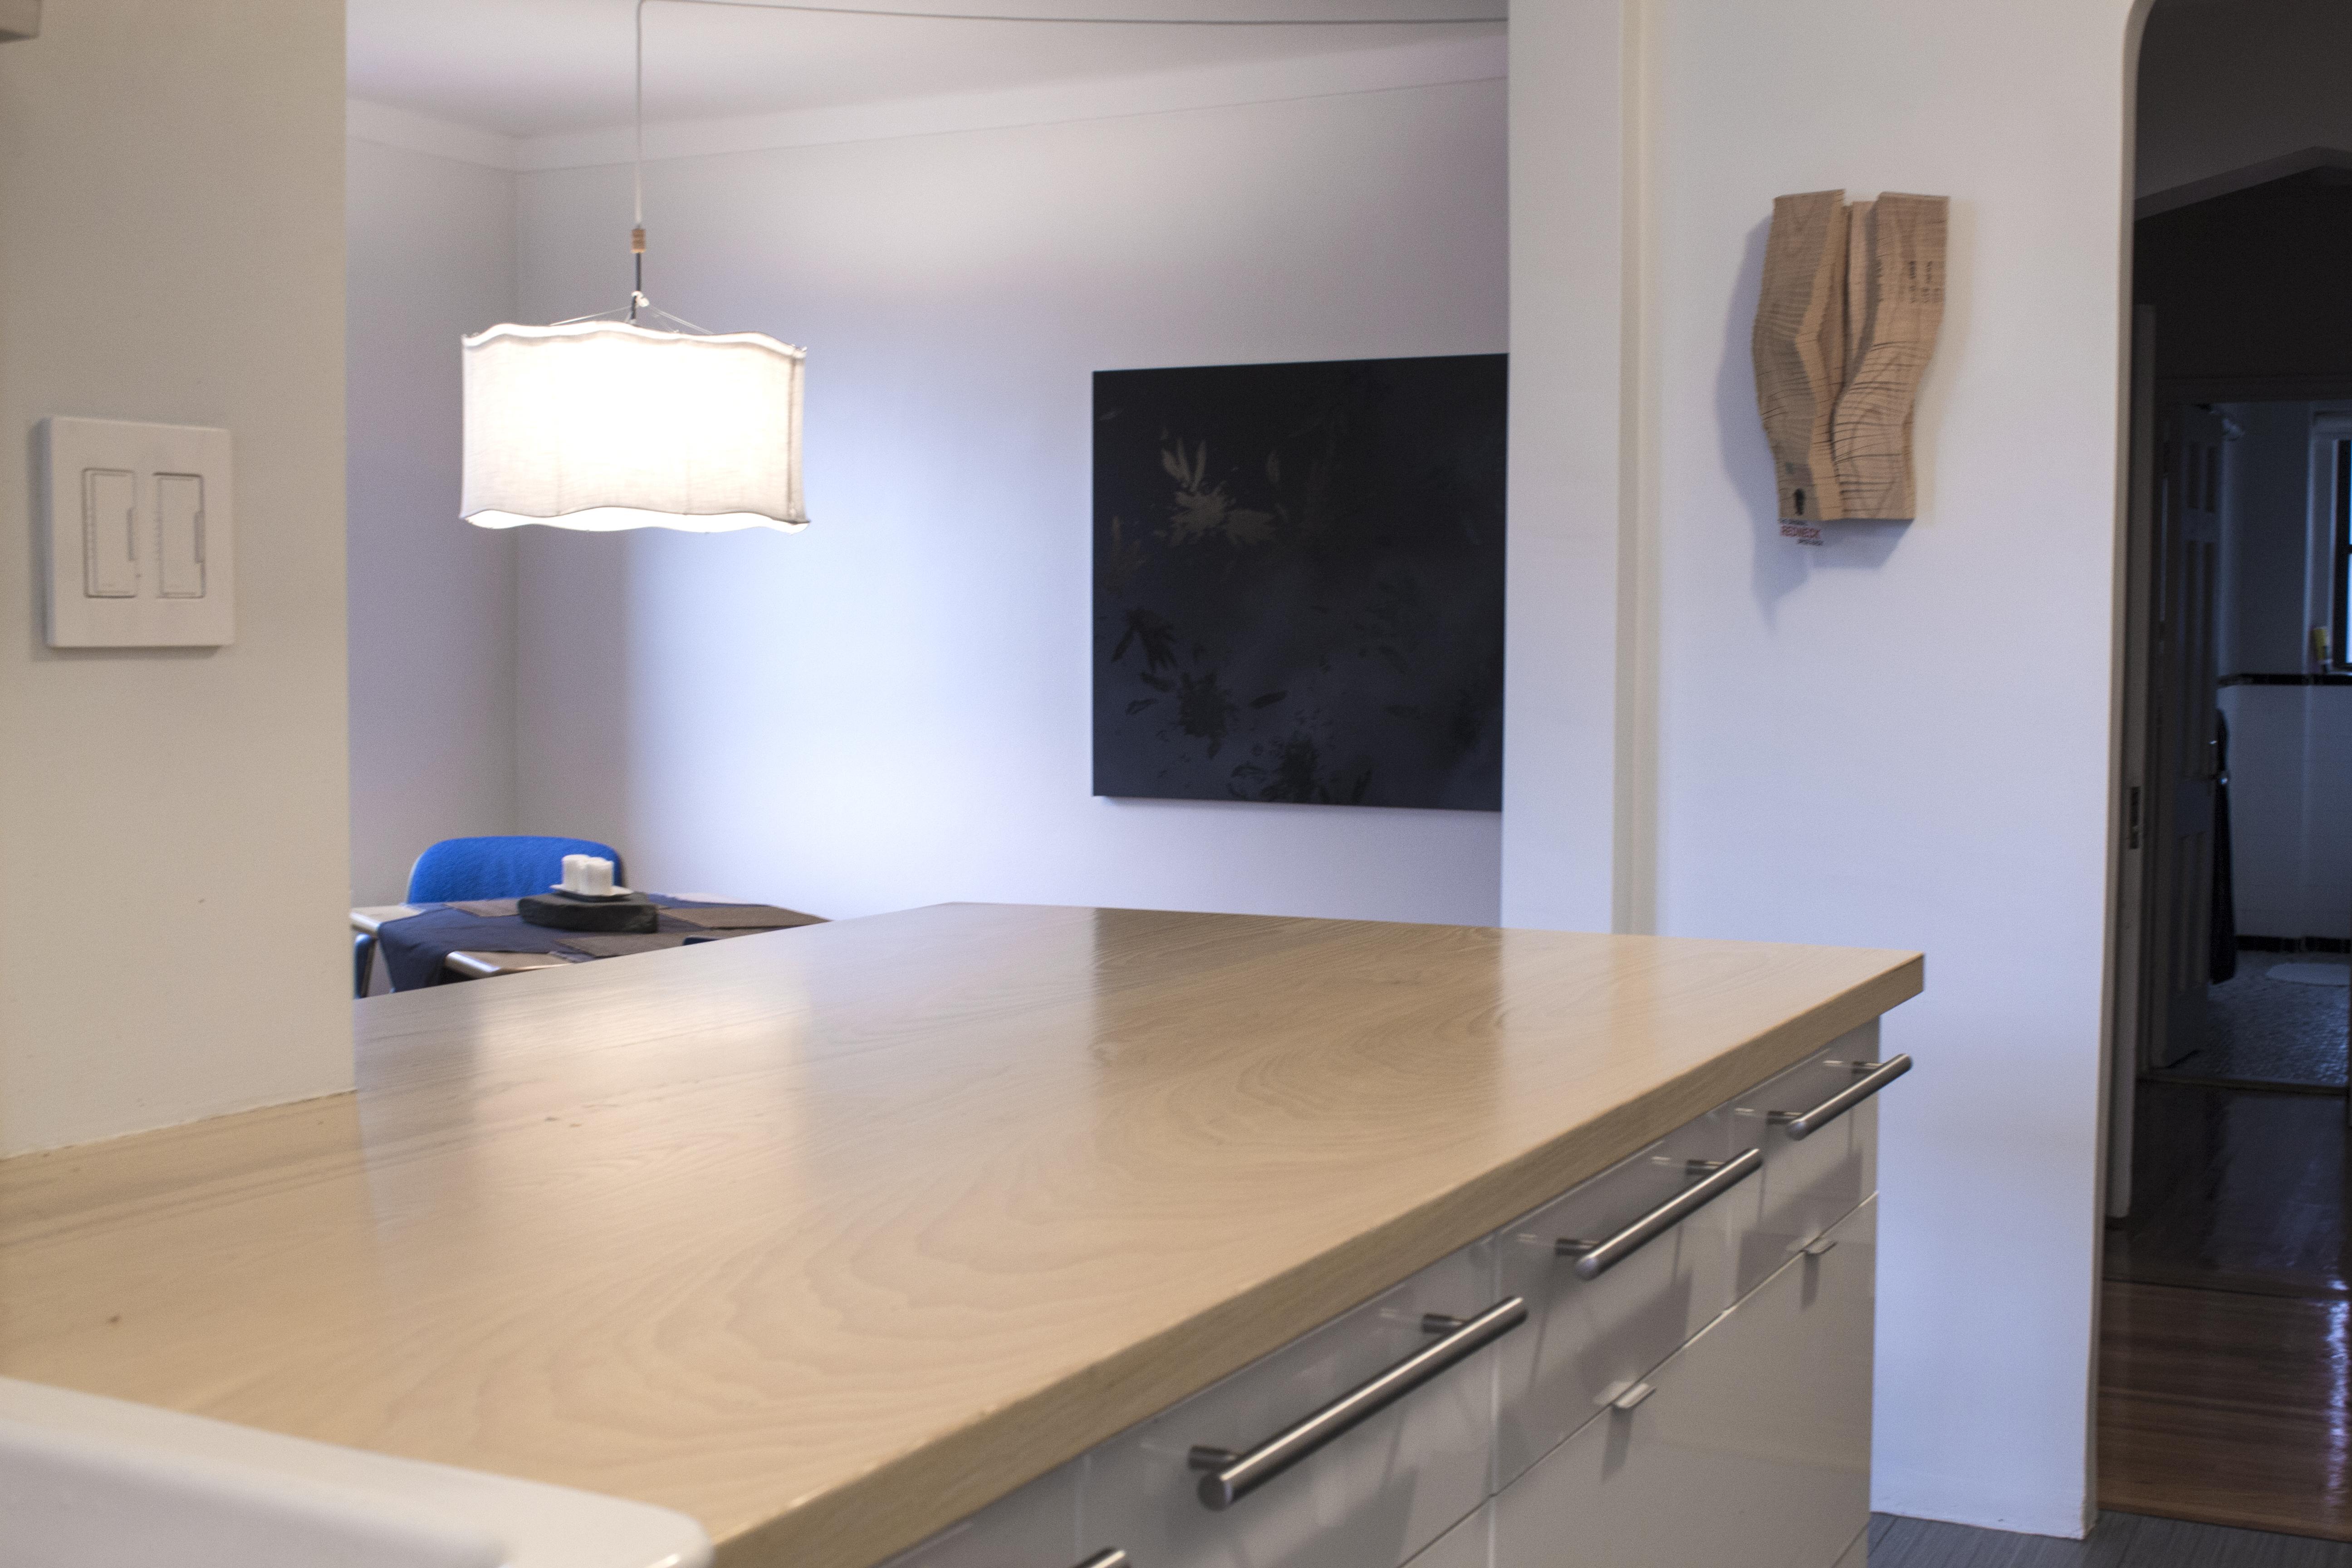 Ash Wood Countertop Gallery by DeVos Custom Woodworking